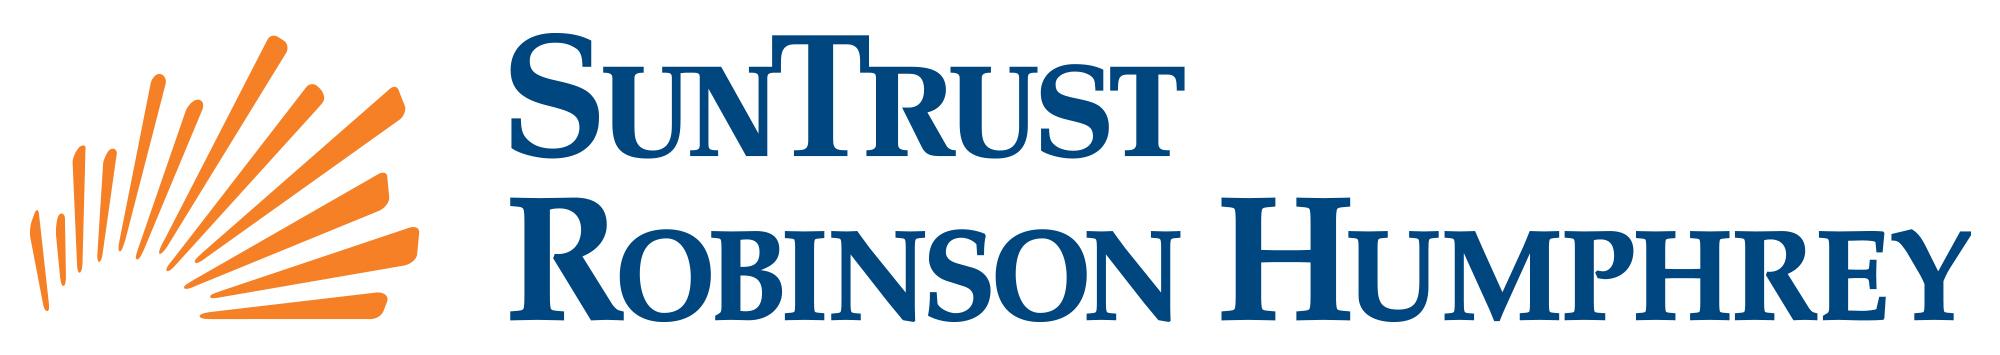 SunTrust Robinson Humphrey (STRH) Logo RGB Color JPEG-12 RAY